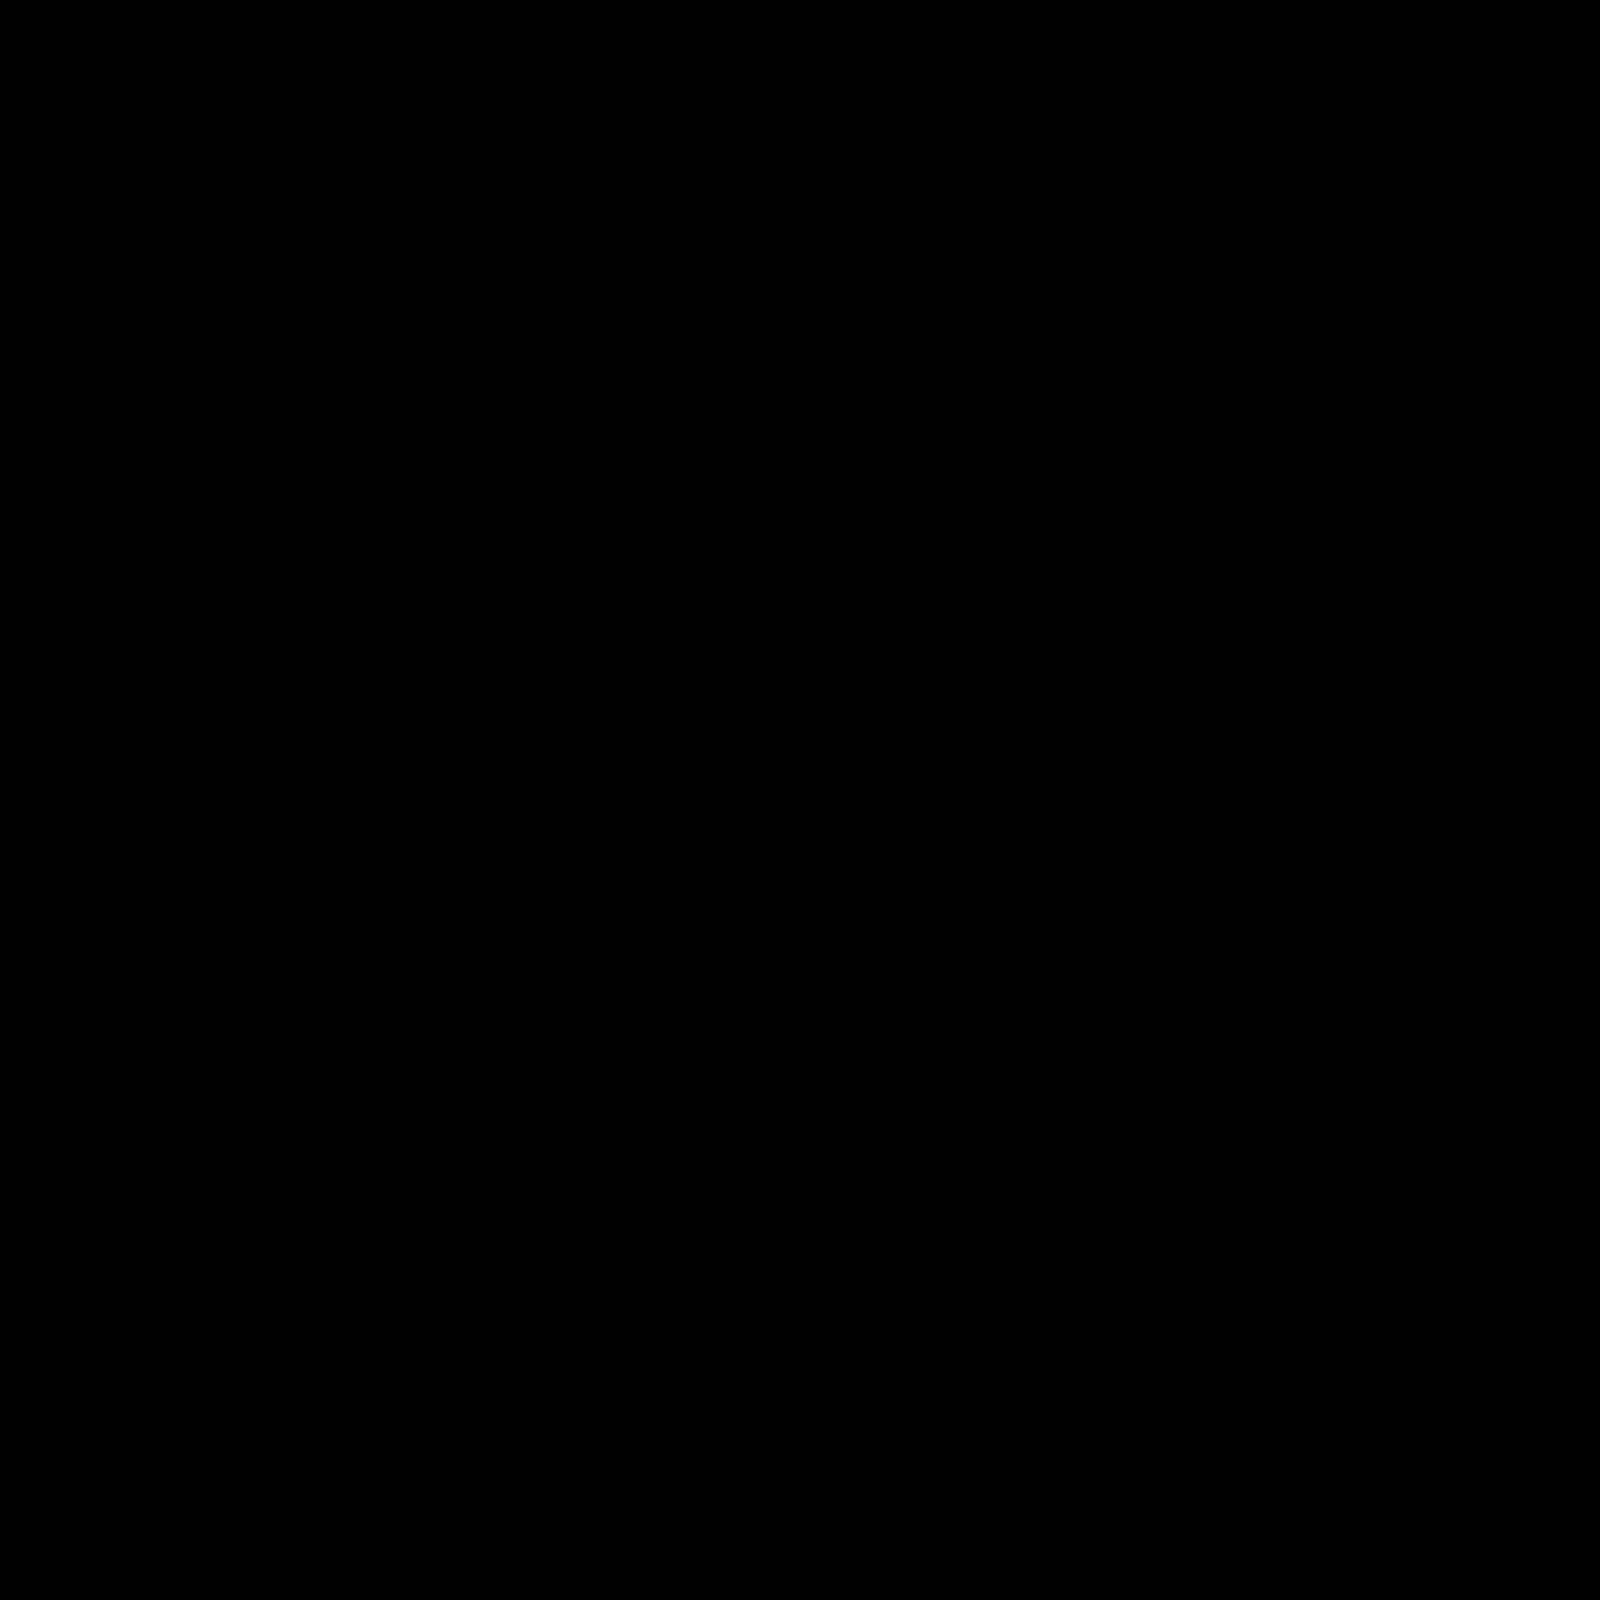 Medium Old Filled icon